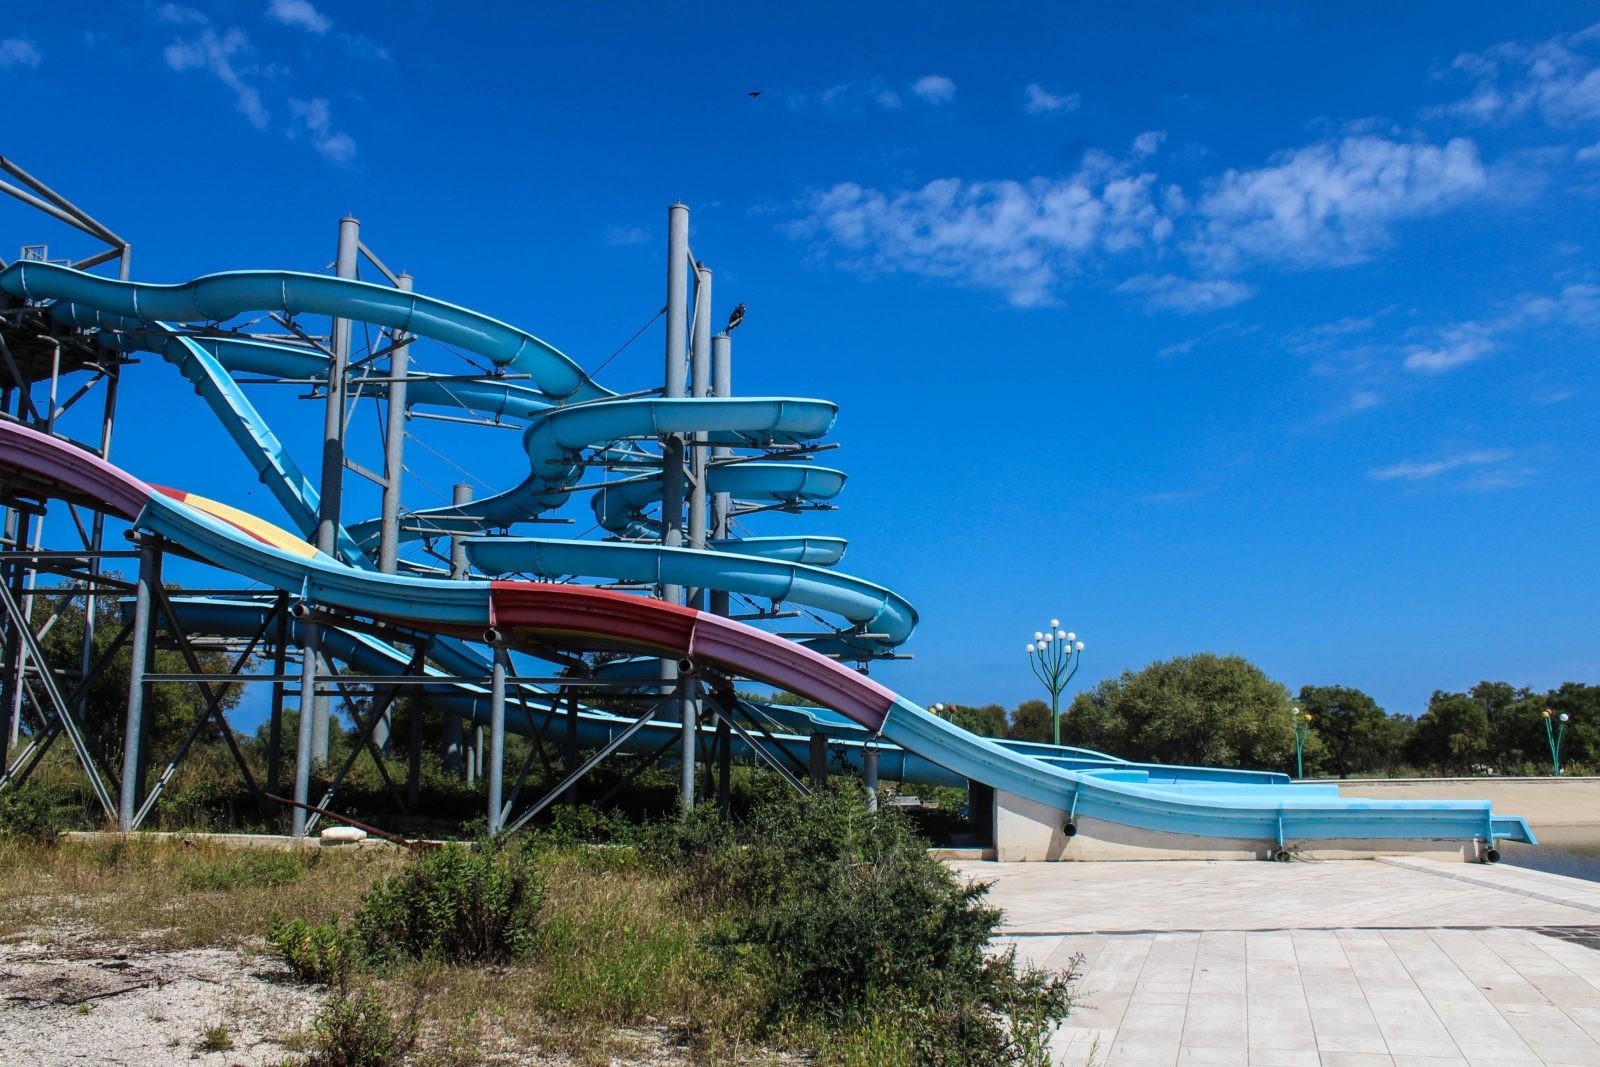 Parco Acquatico Abbandonato Ad Orosei Sardinia Urbex